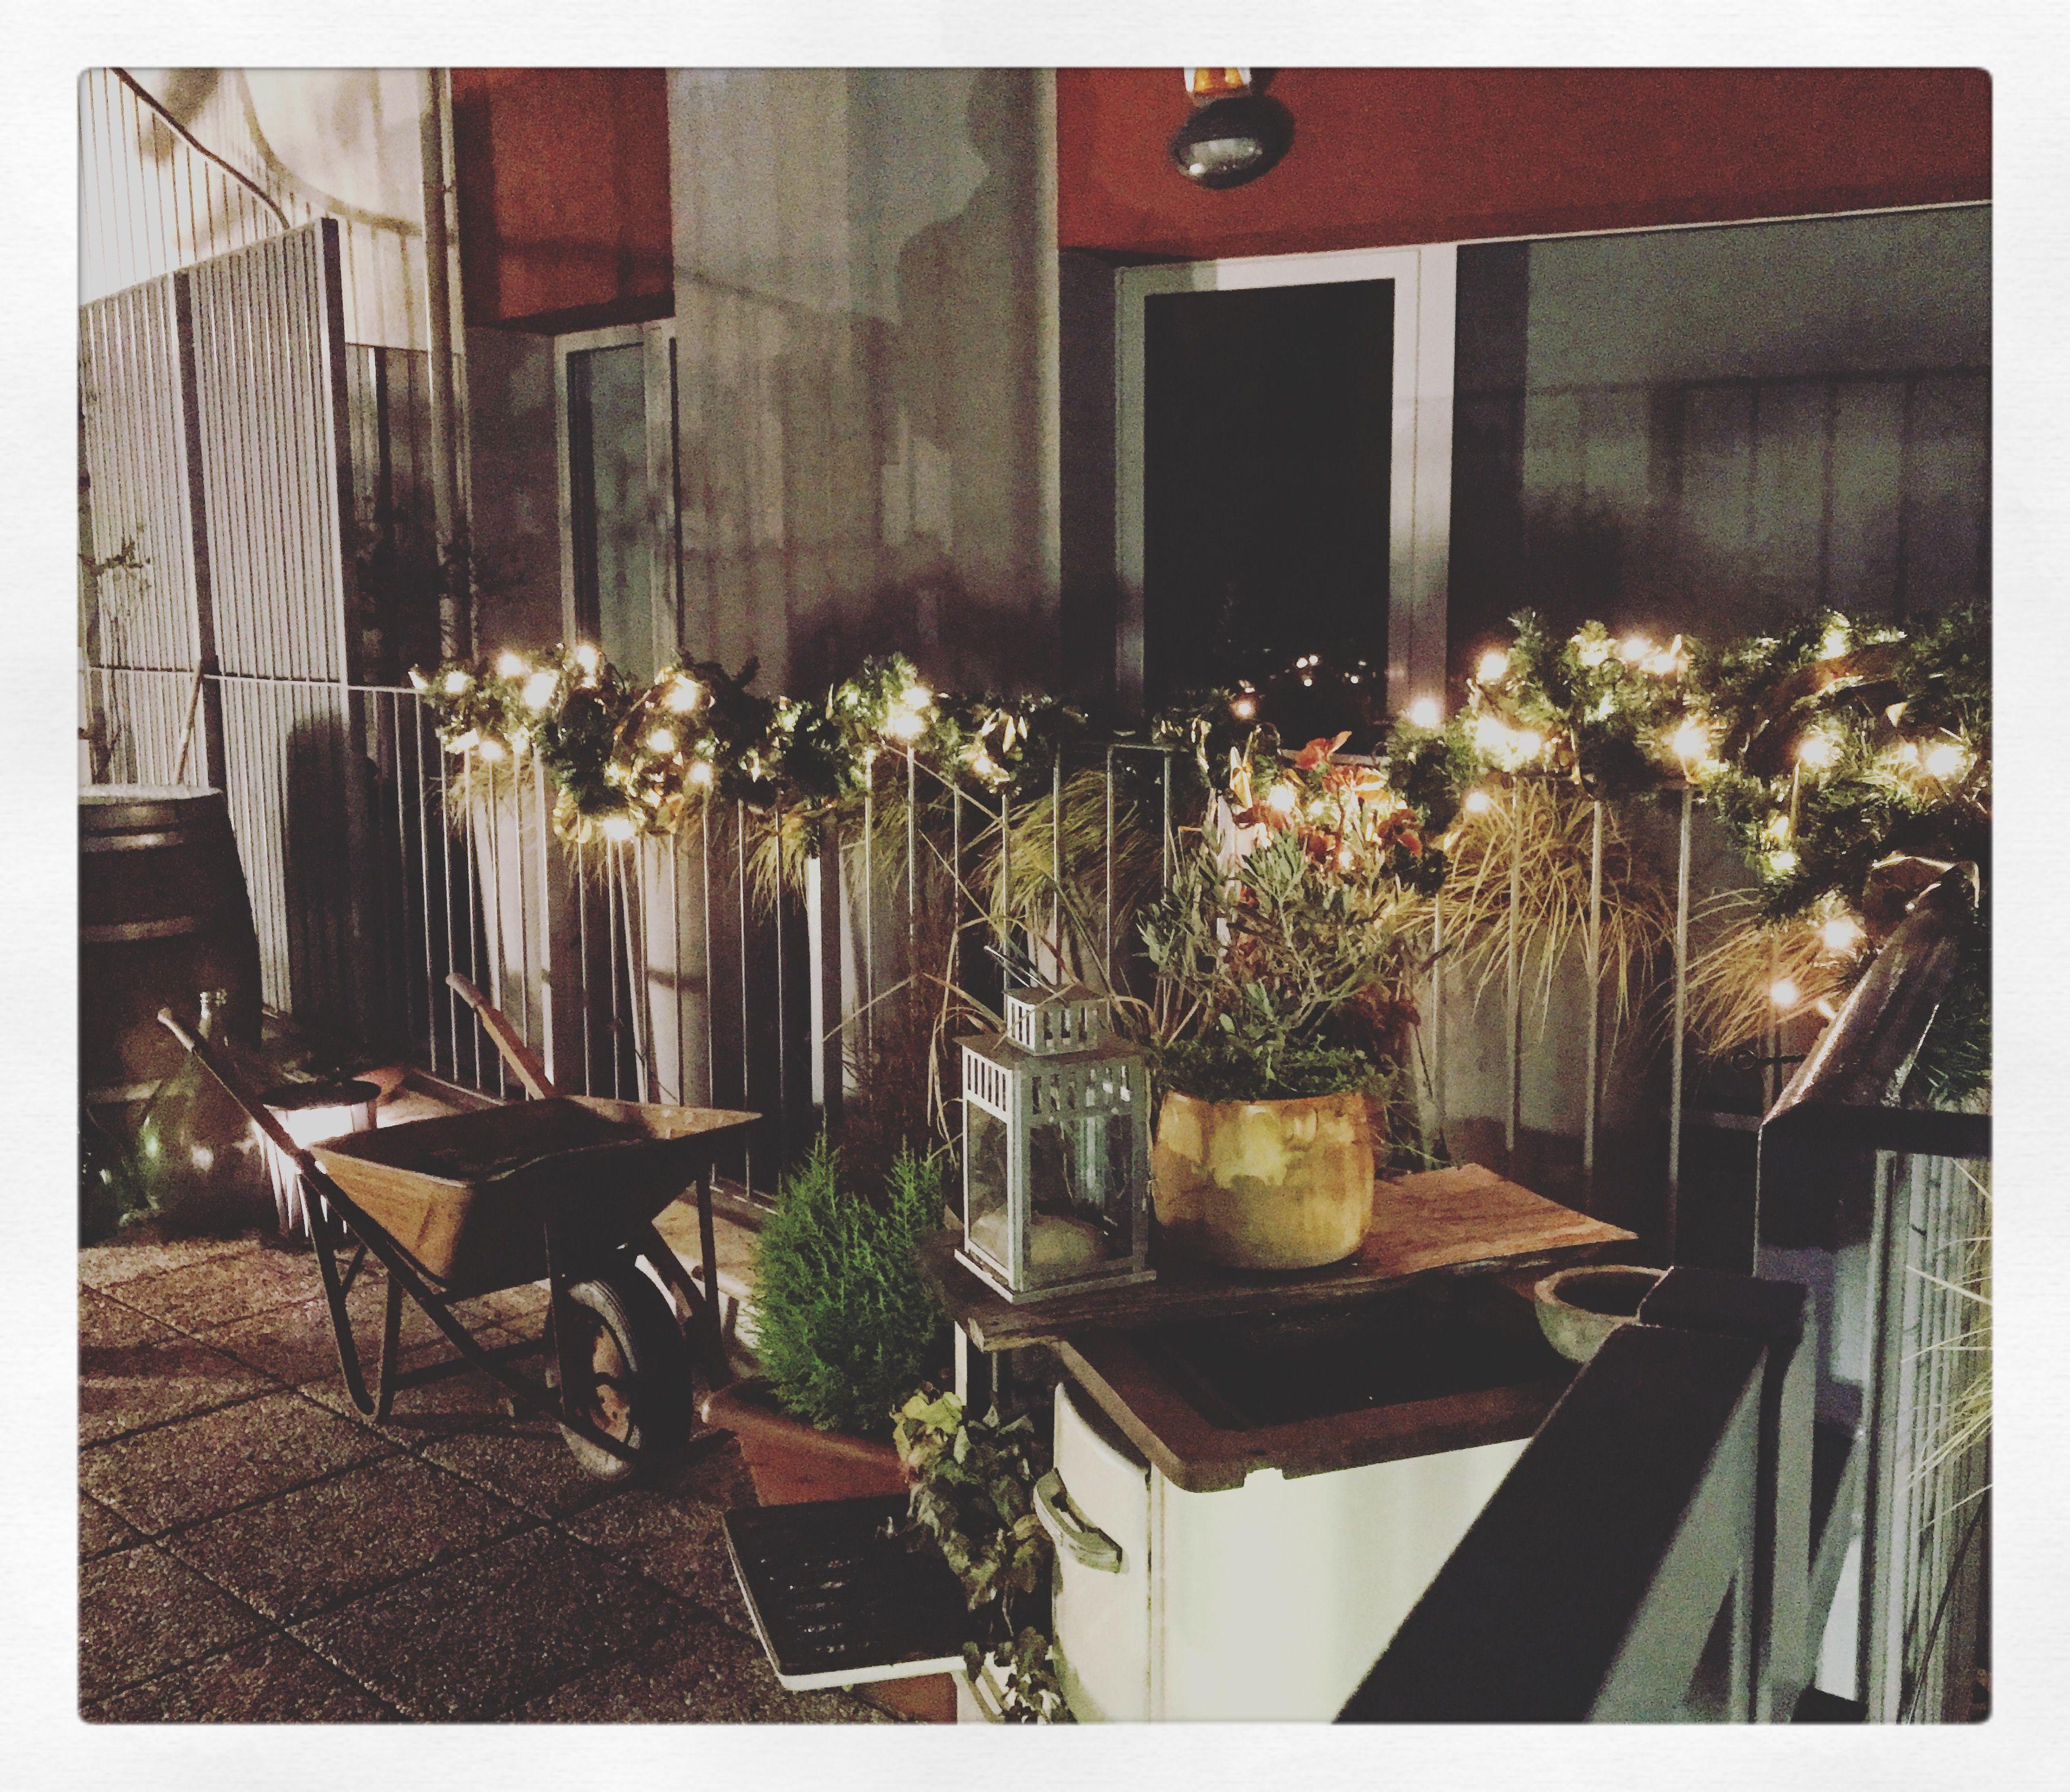 #outdoor #homedecore #terrace